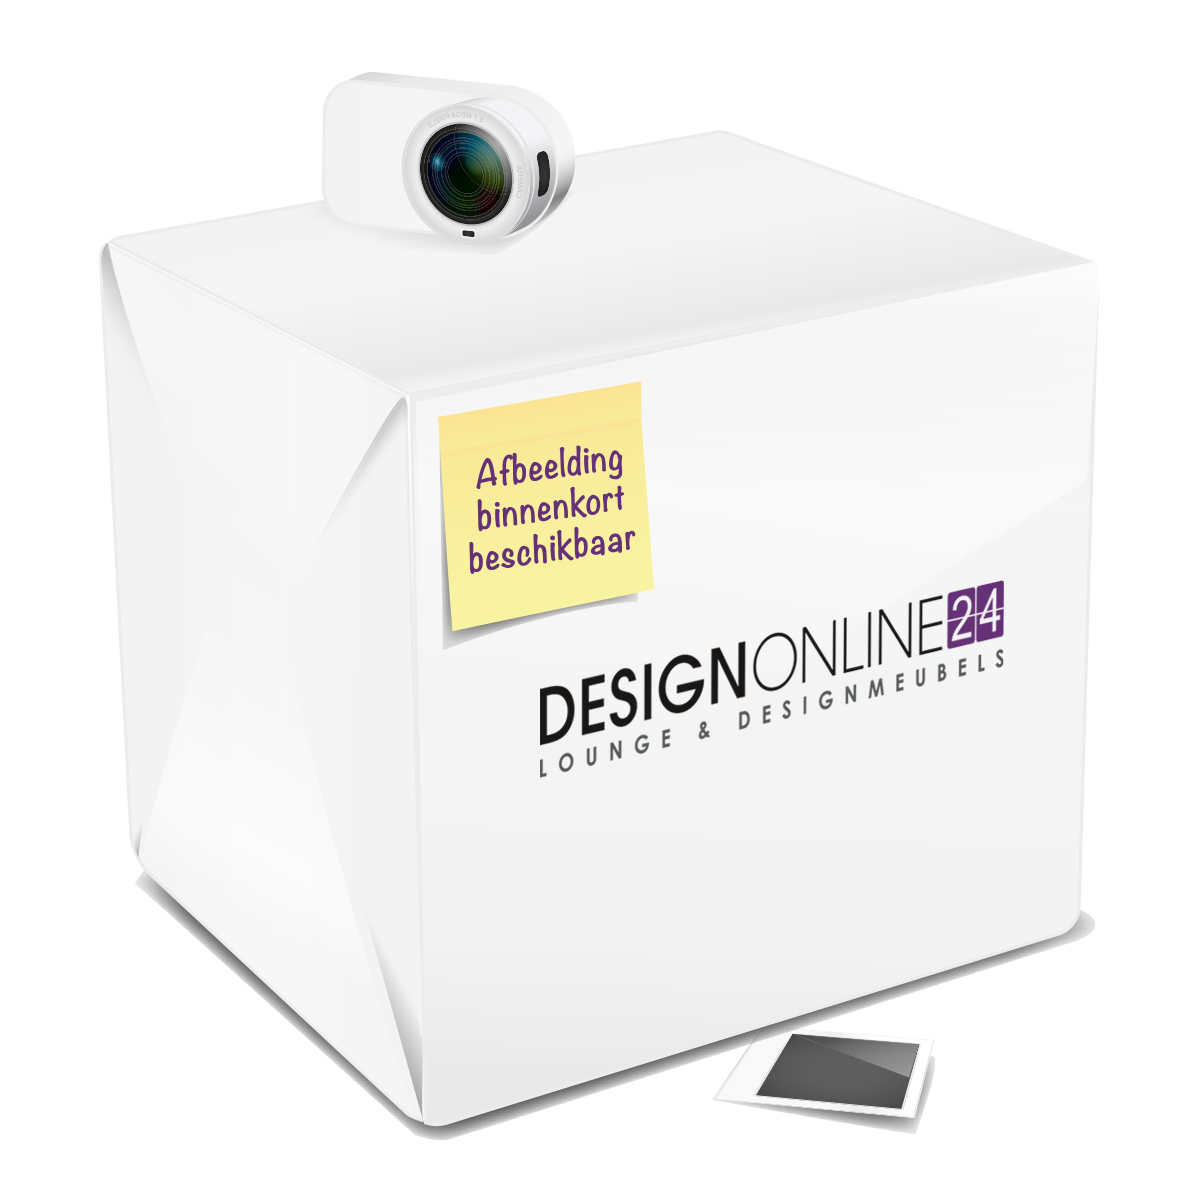 Innovation Slaapbank Dublexo - Styletto Poten Licht - Twist Charcoal 563 - Grijs